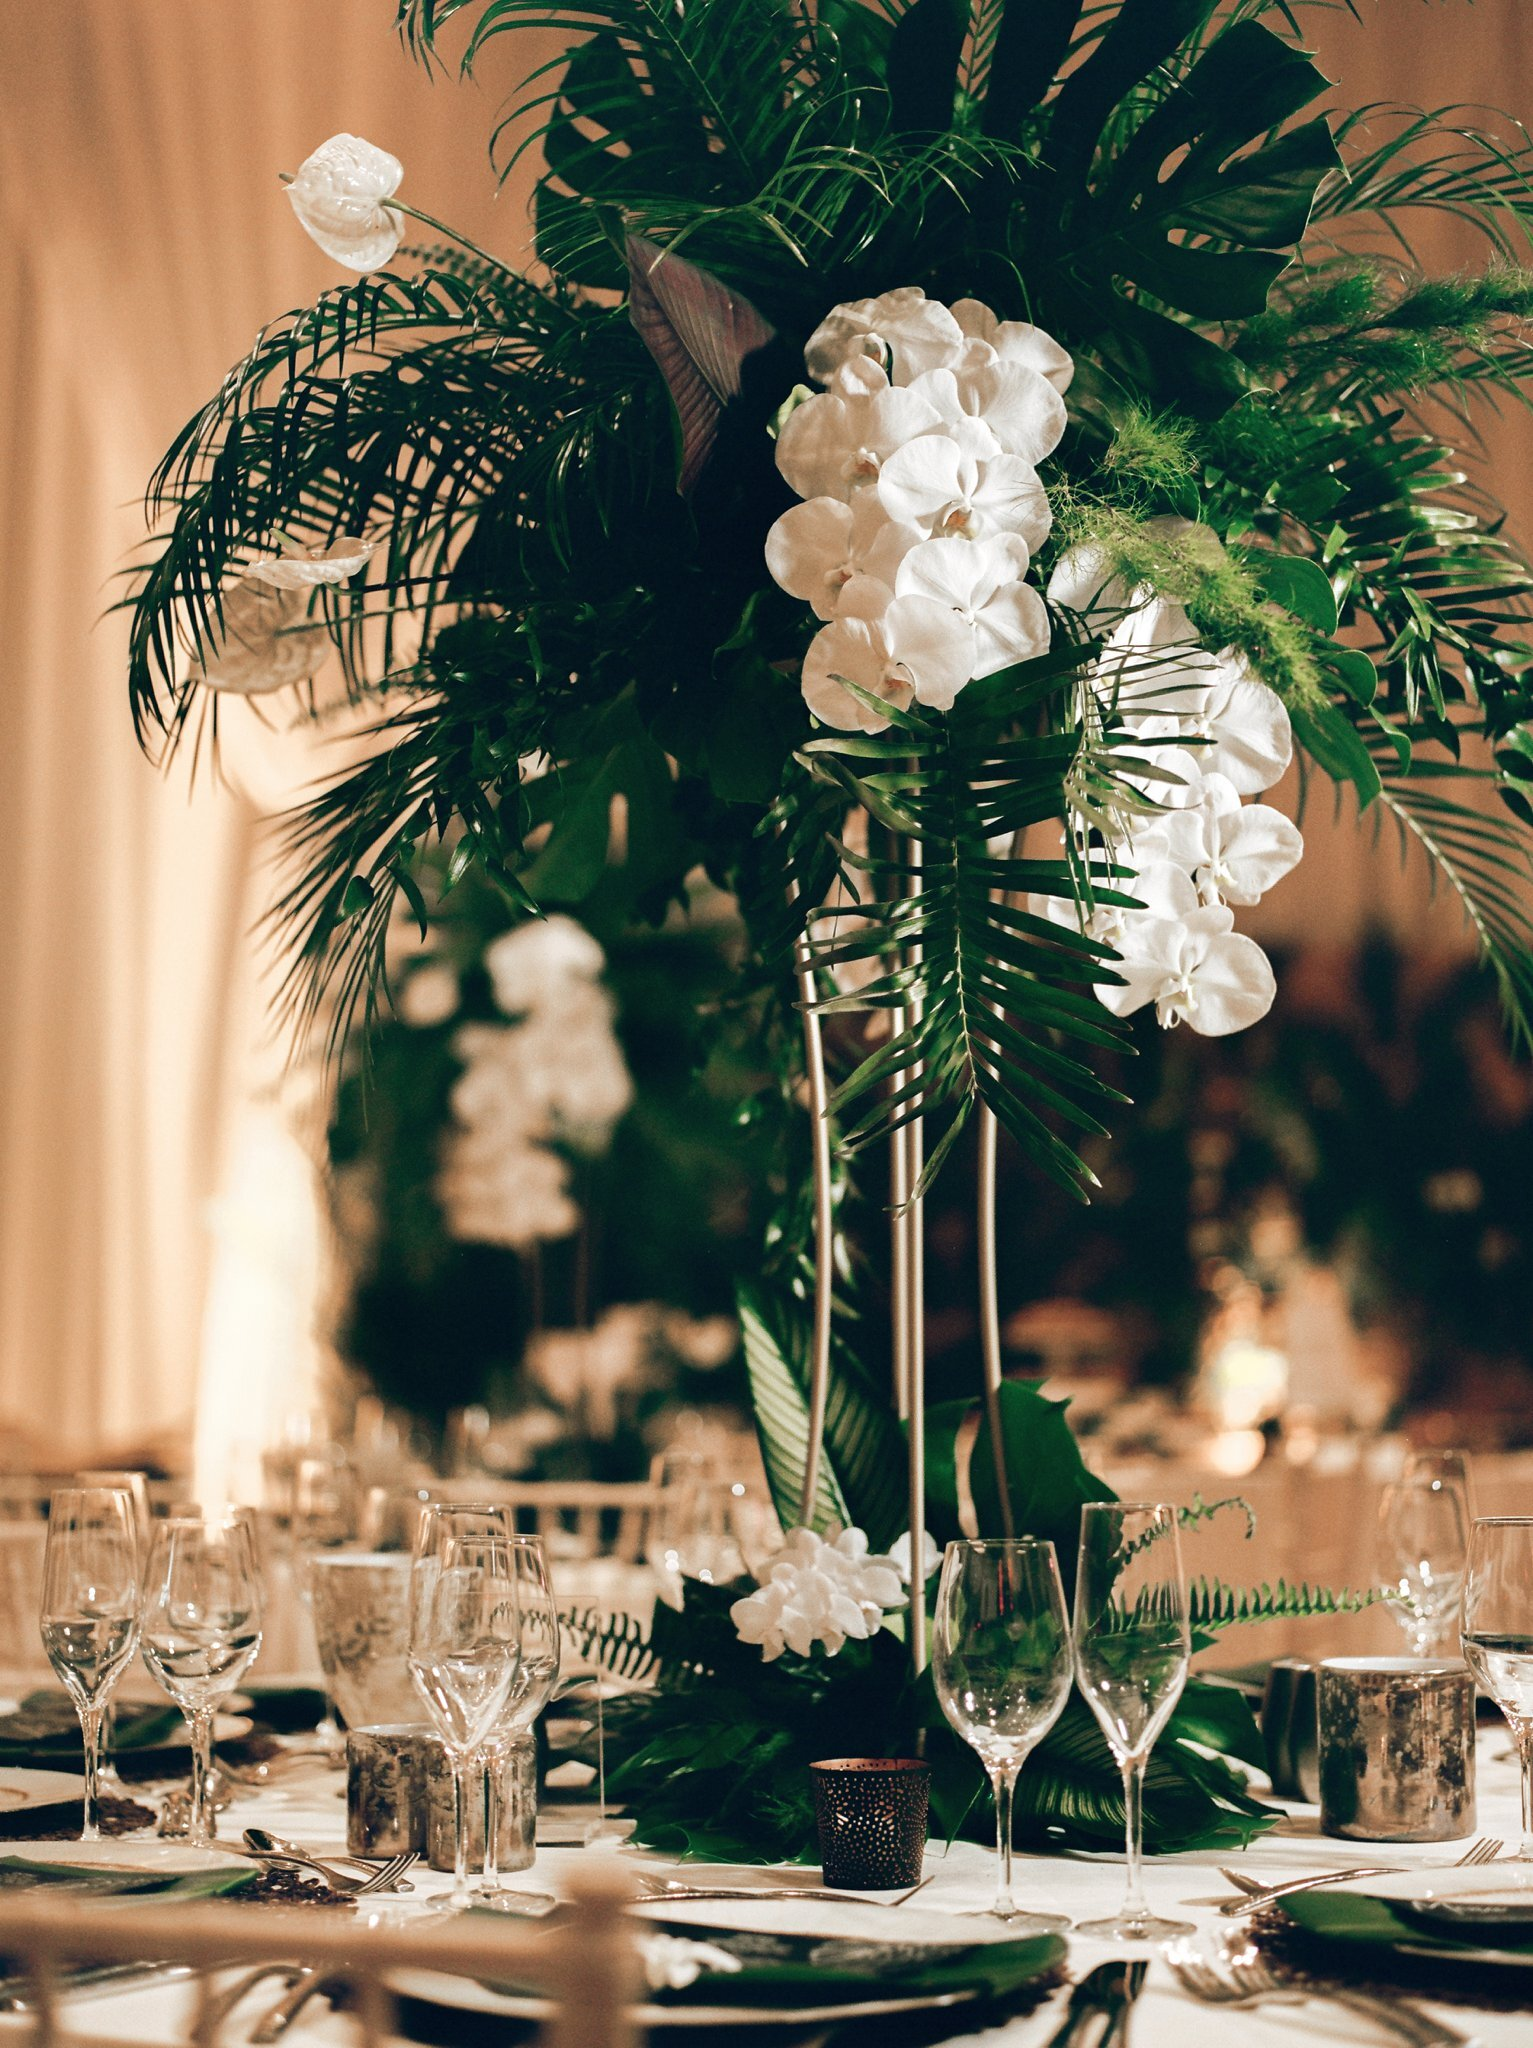 jw marriott marco island wedding photographer marco island wedding photographer shannon griffin photography_0192.jpg